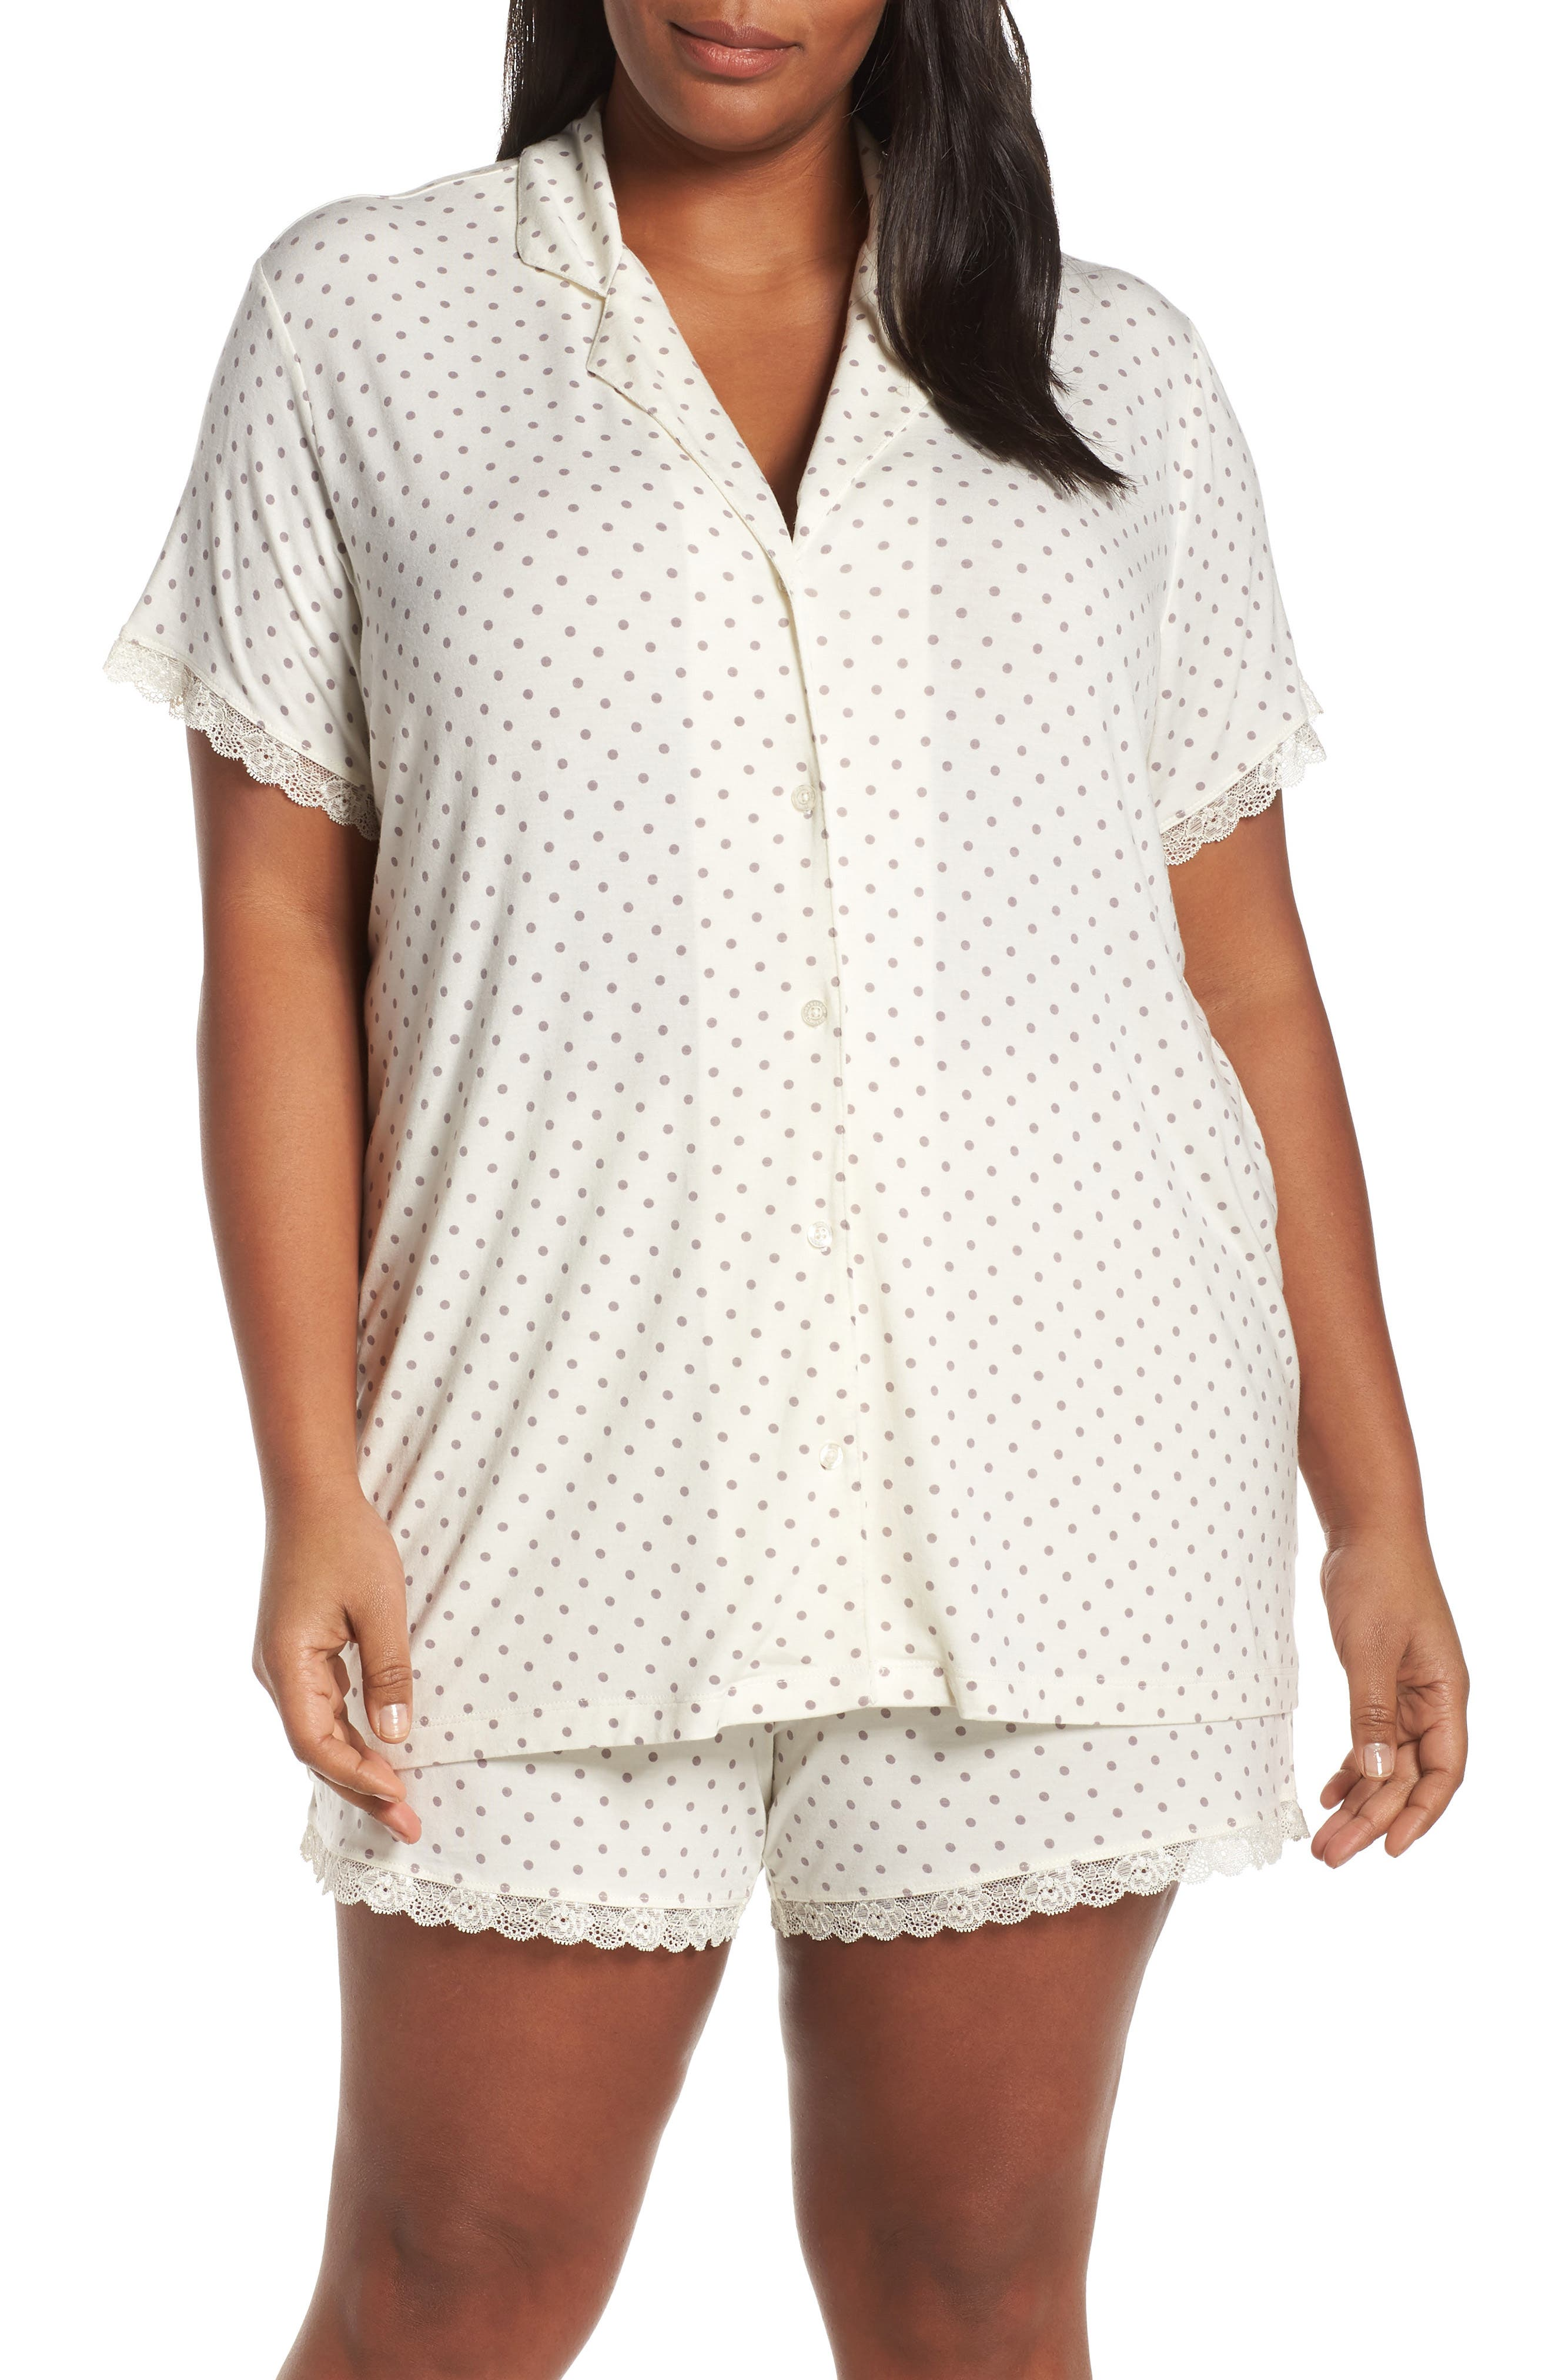 Plus Size Nordstrom Lingerie Moonlight Shortie Pajamas, Ivory